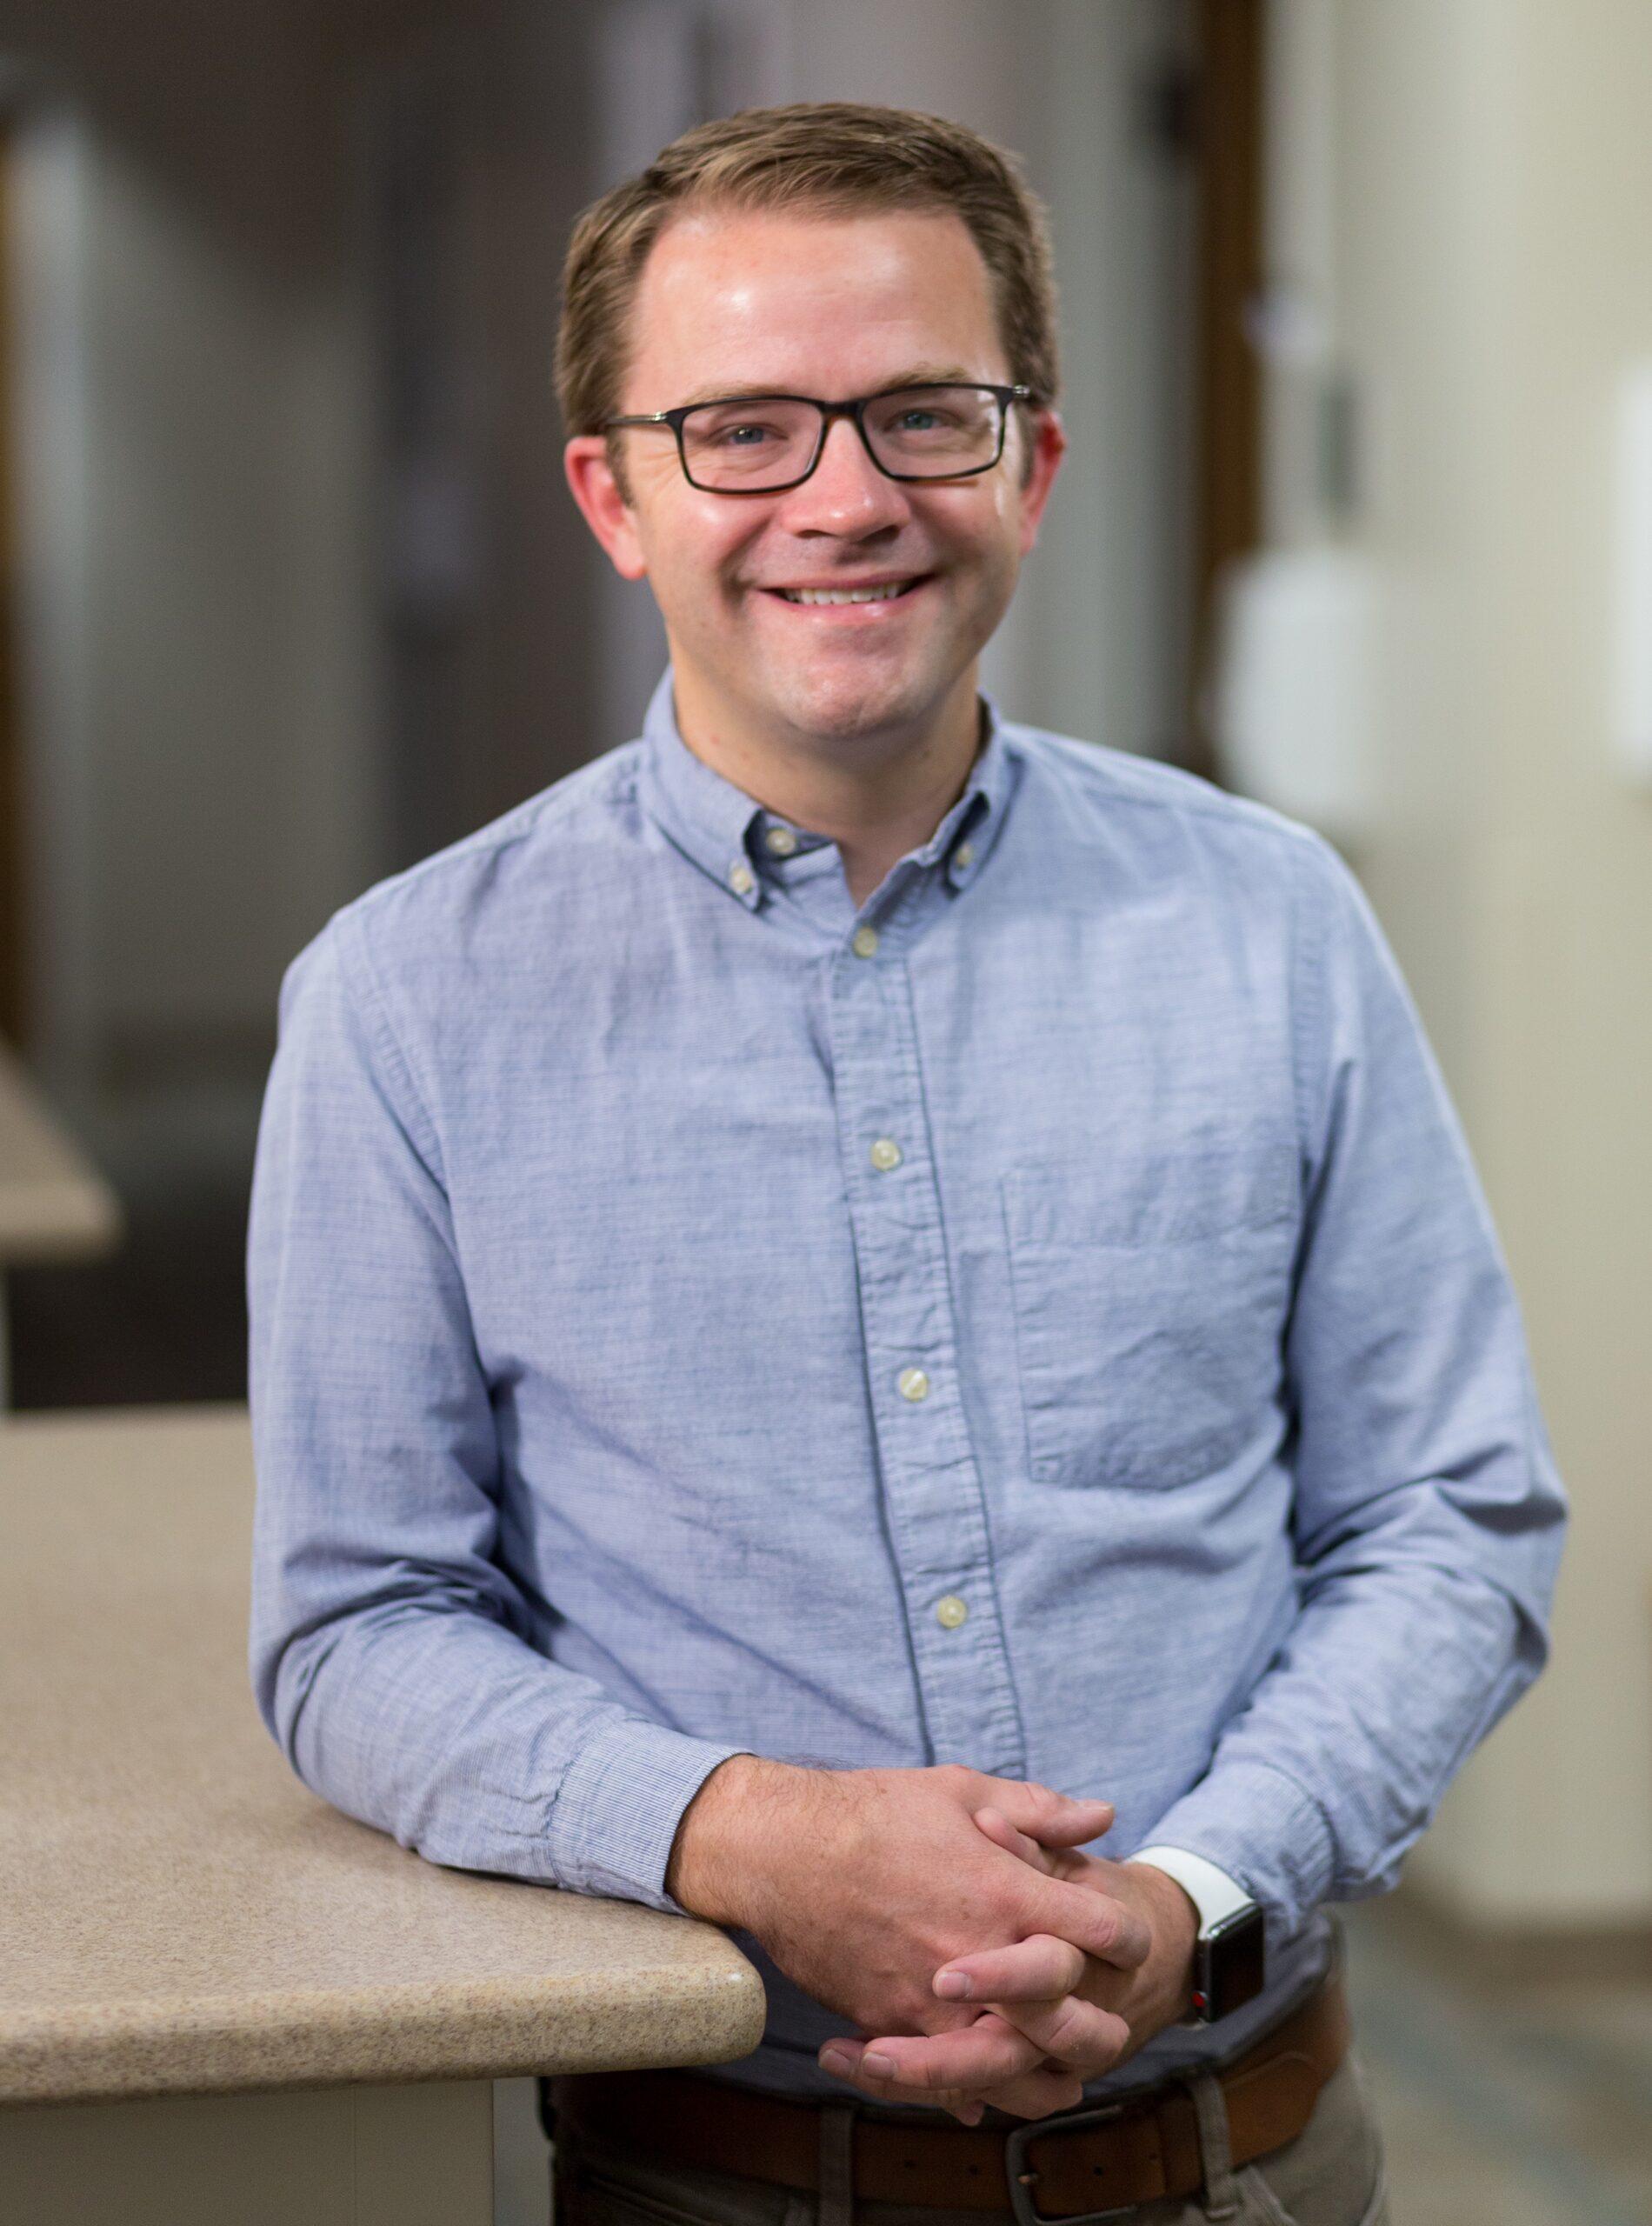 Bryan Larson, Dentist